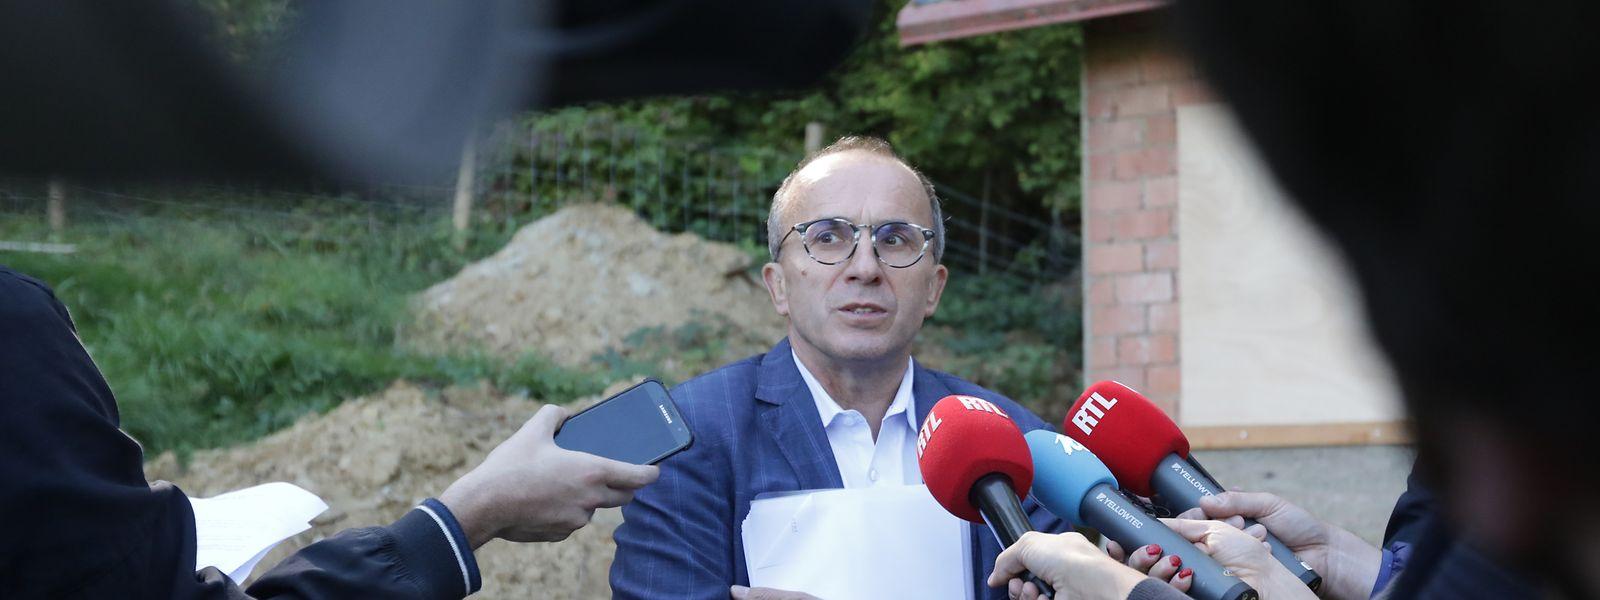 "Roberto Traversini hat sein ""Mea culpa"" gemacht."